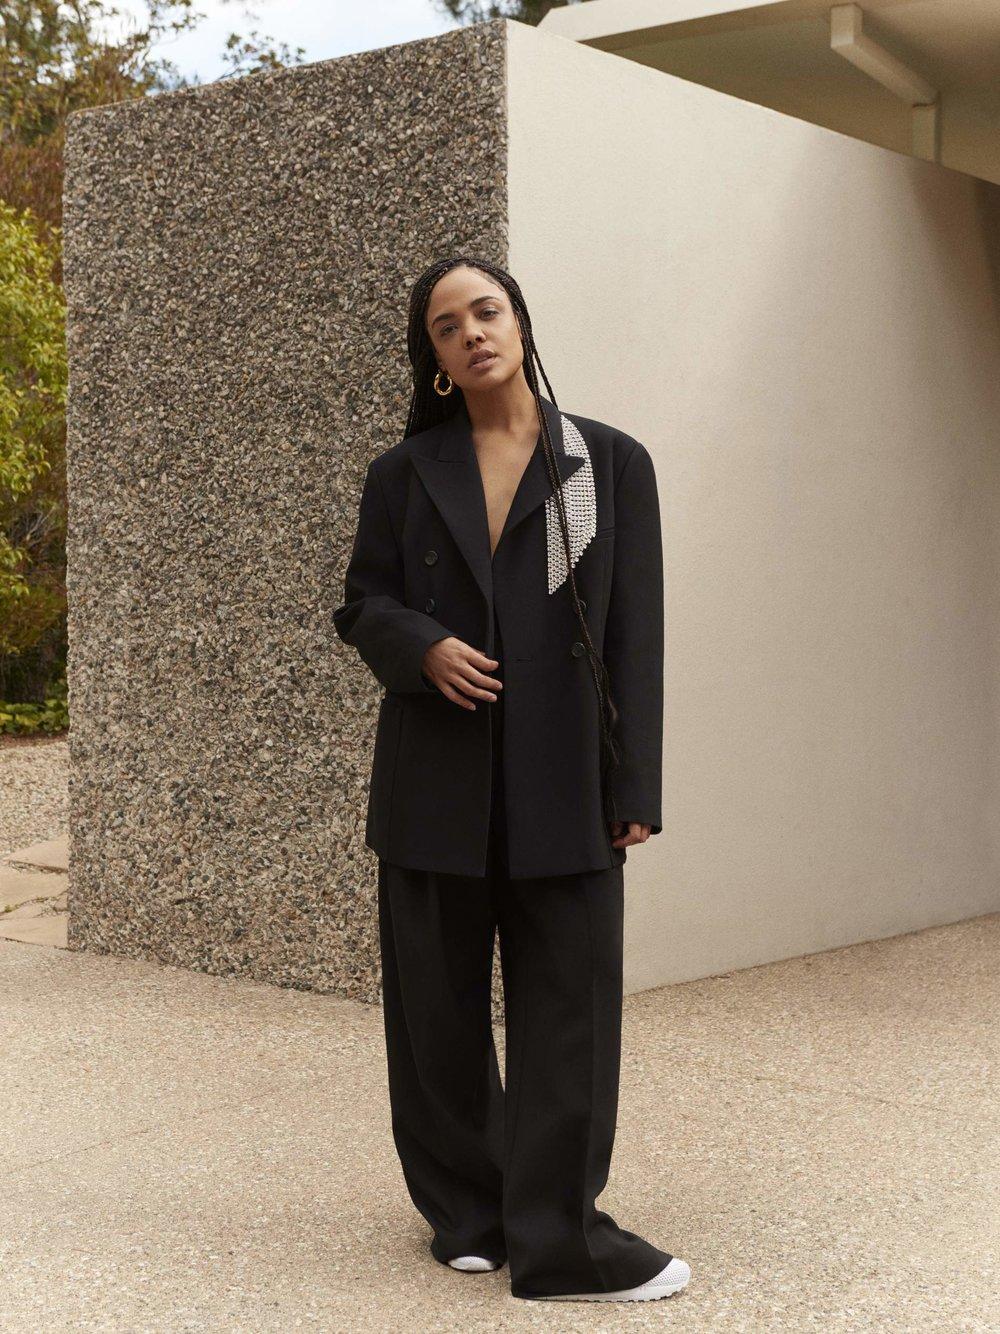 - Blazer Christopher Kane; pants JW Anderson; sneakers Nike; earring (sold as pair) Laura Lombardi